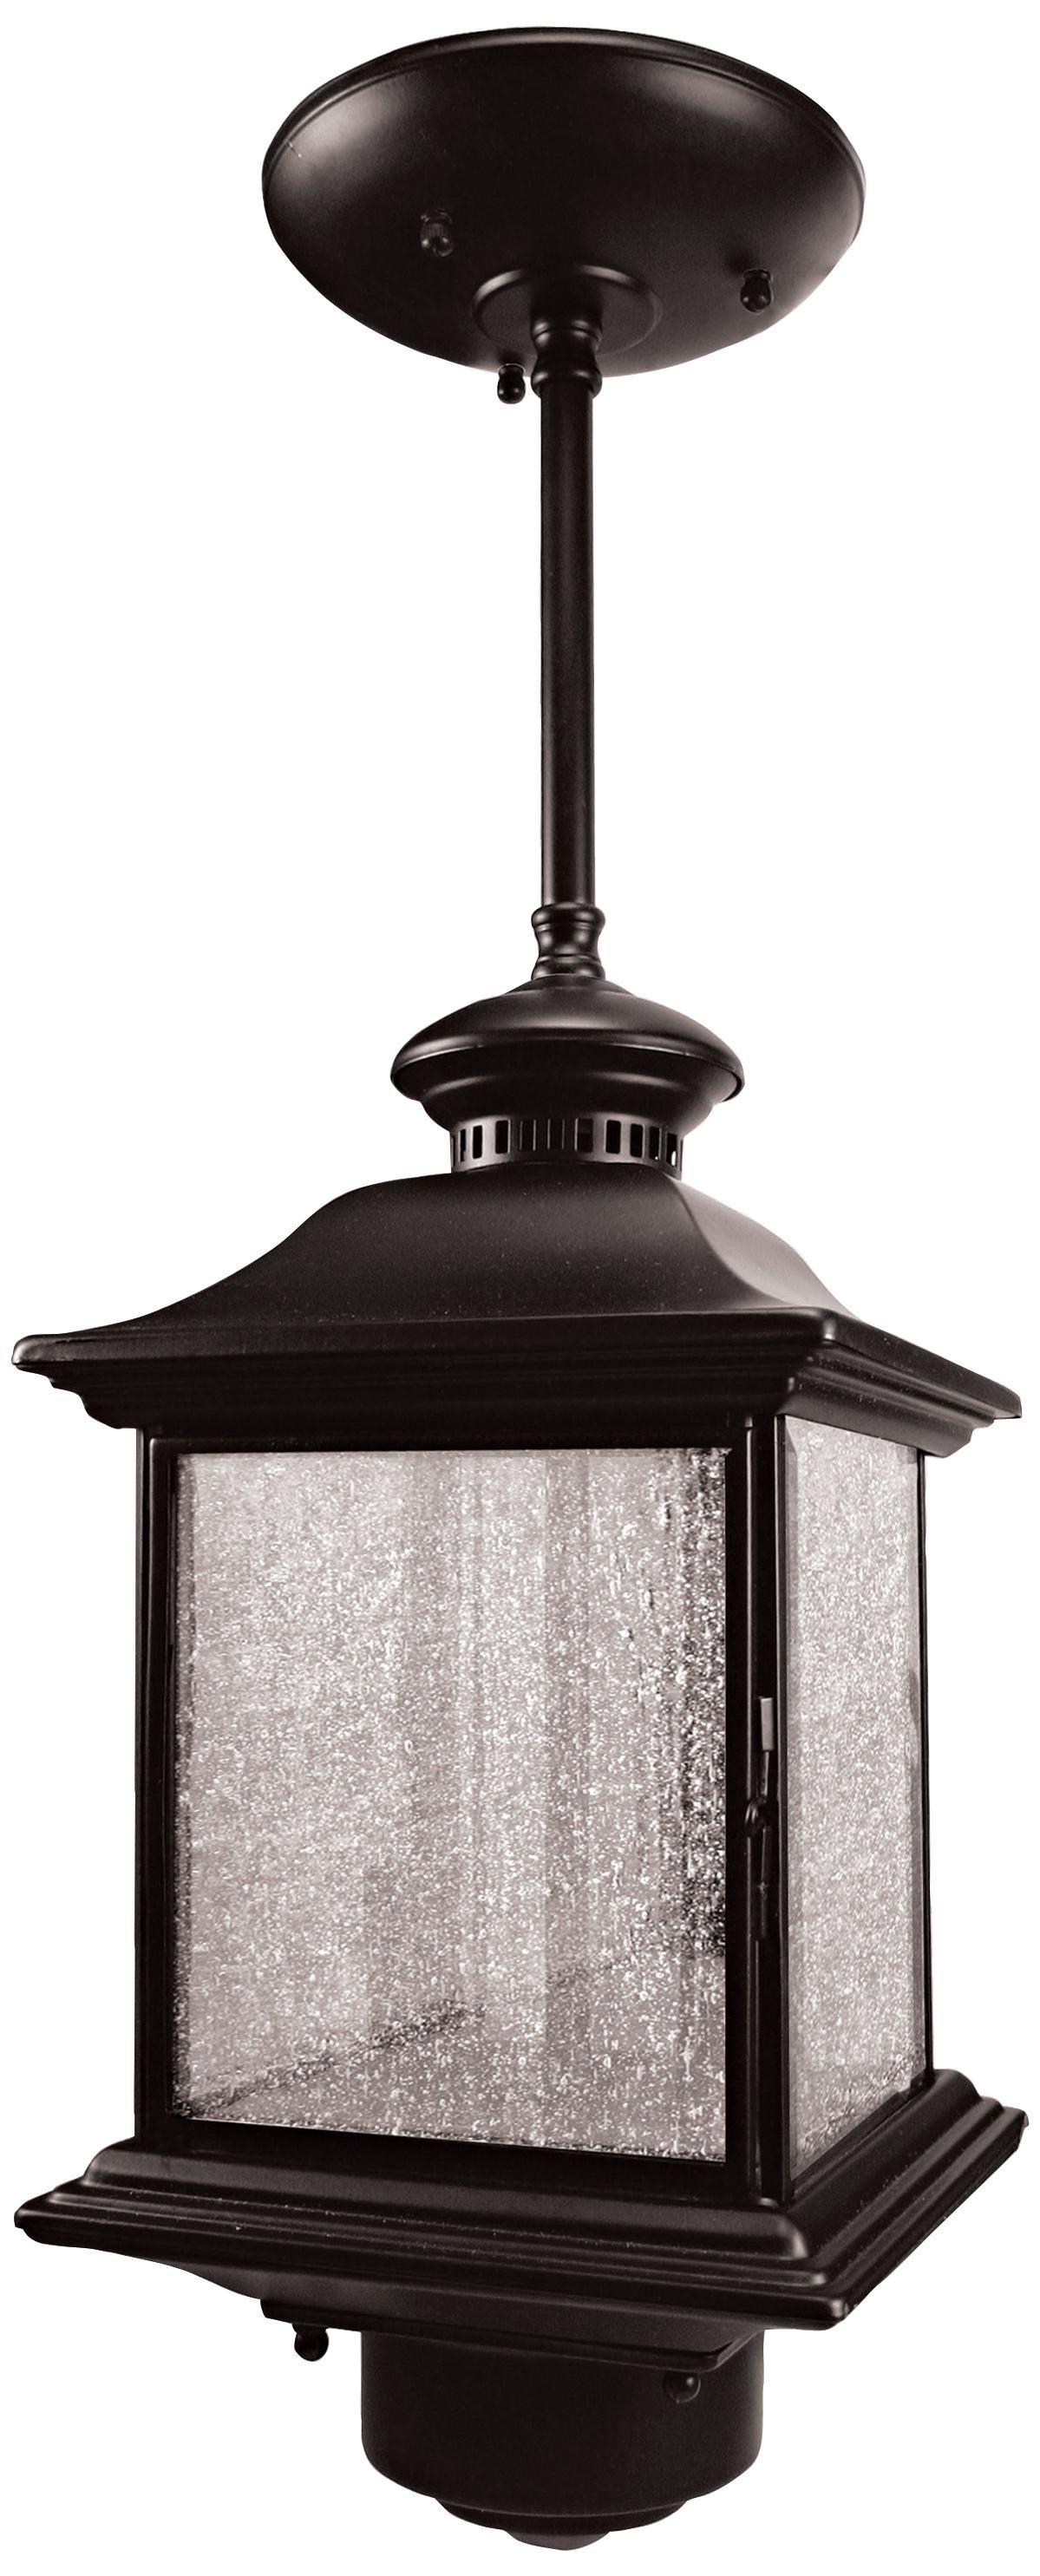 Black Finish 14 High Hanging Outdoor Light H6916 Lamps Plus Outdoor Ceiling Lights Ceiling Lights Motion Sensor Lights Outdoor